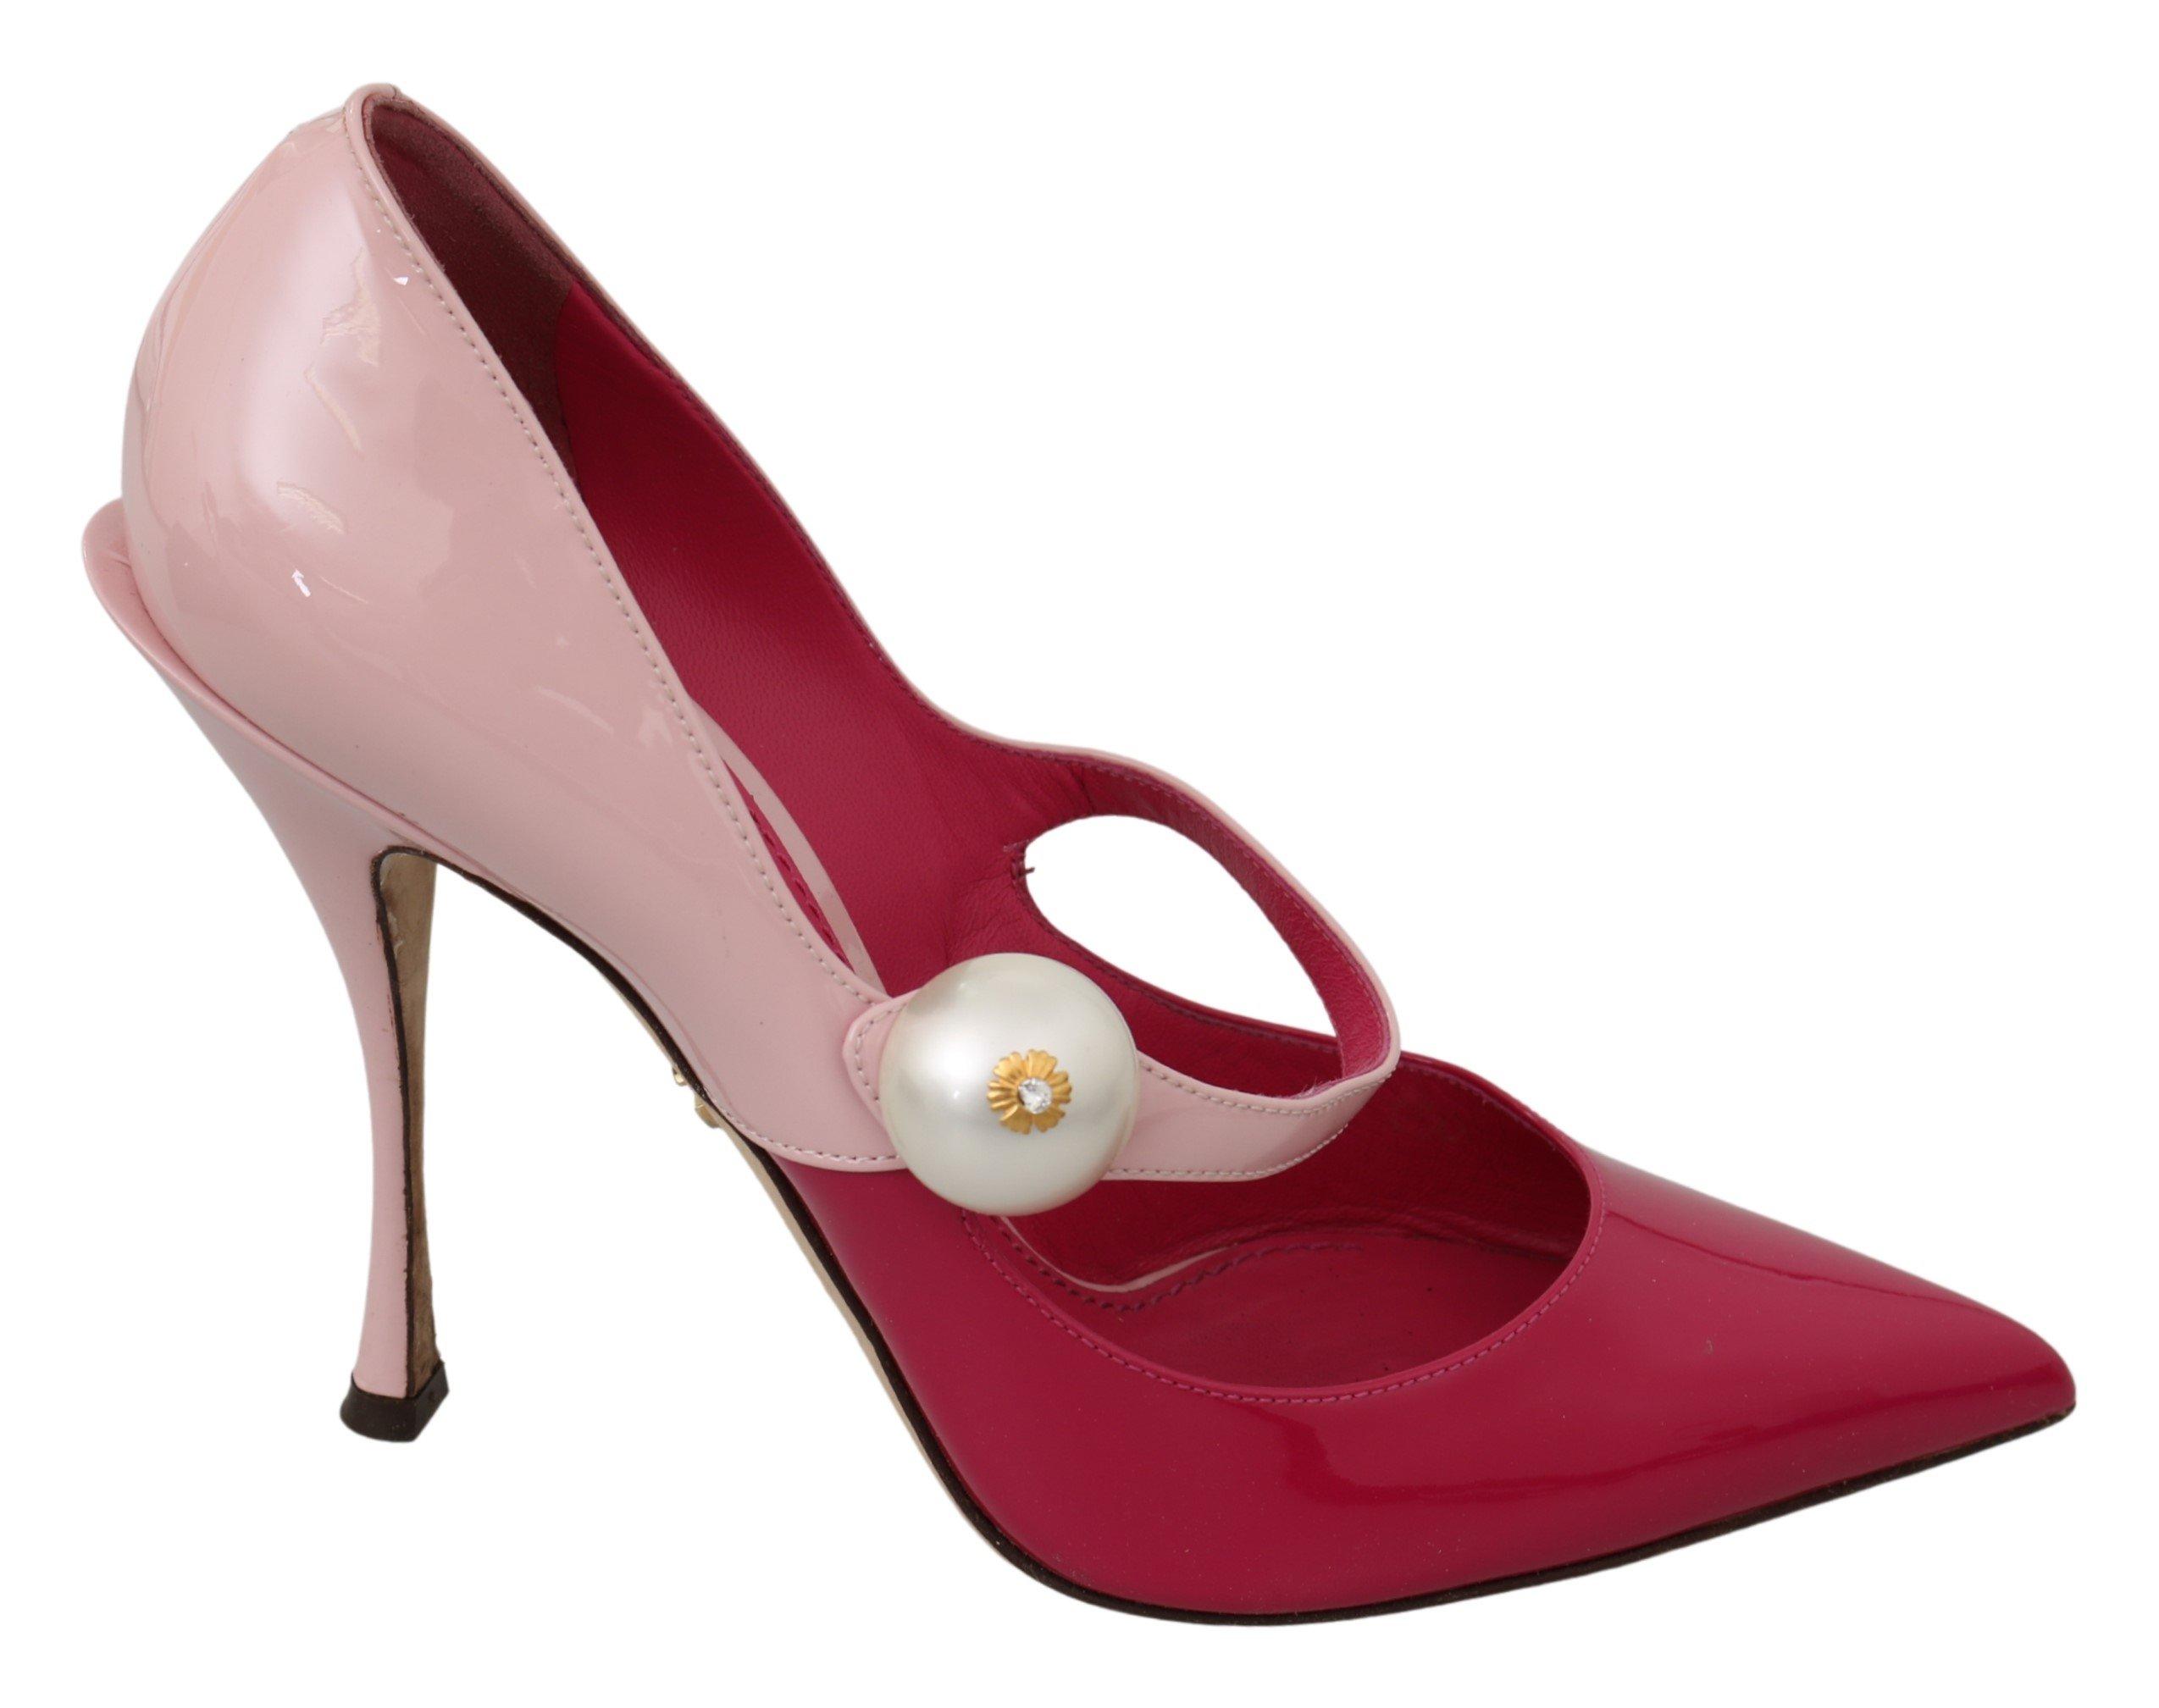 Dolce & Gabbana Women's Leather High Mary Jane Heels Pink LA7136 - EU39/US8.5